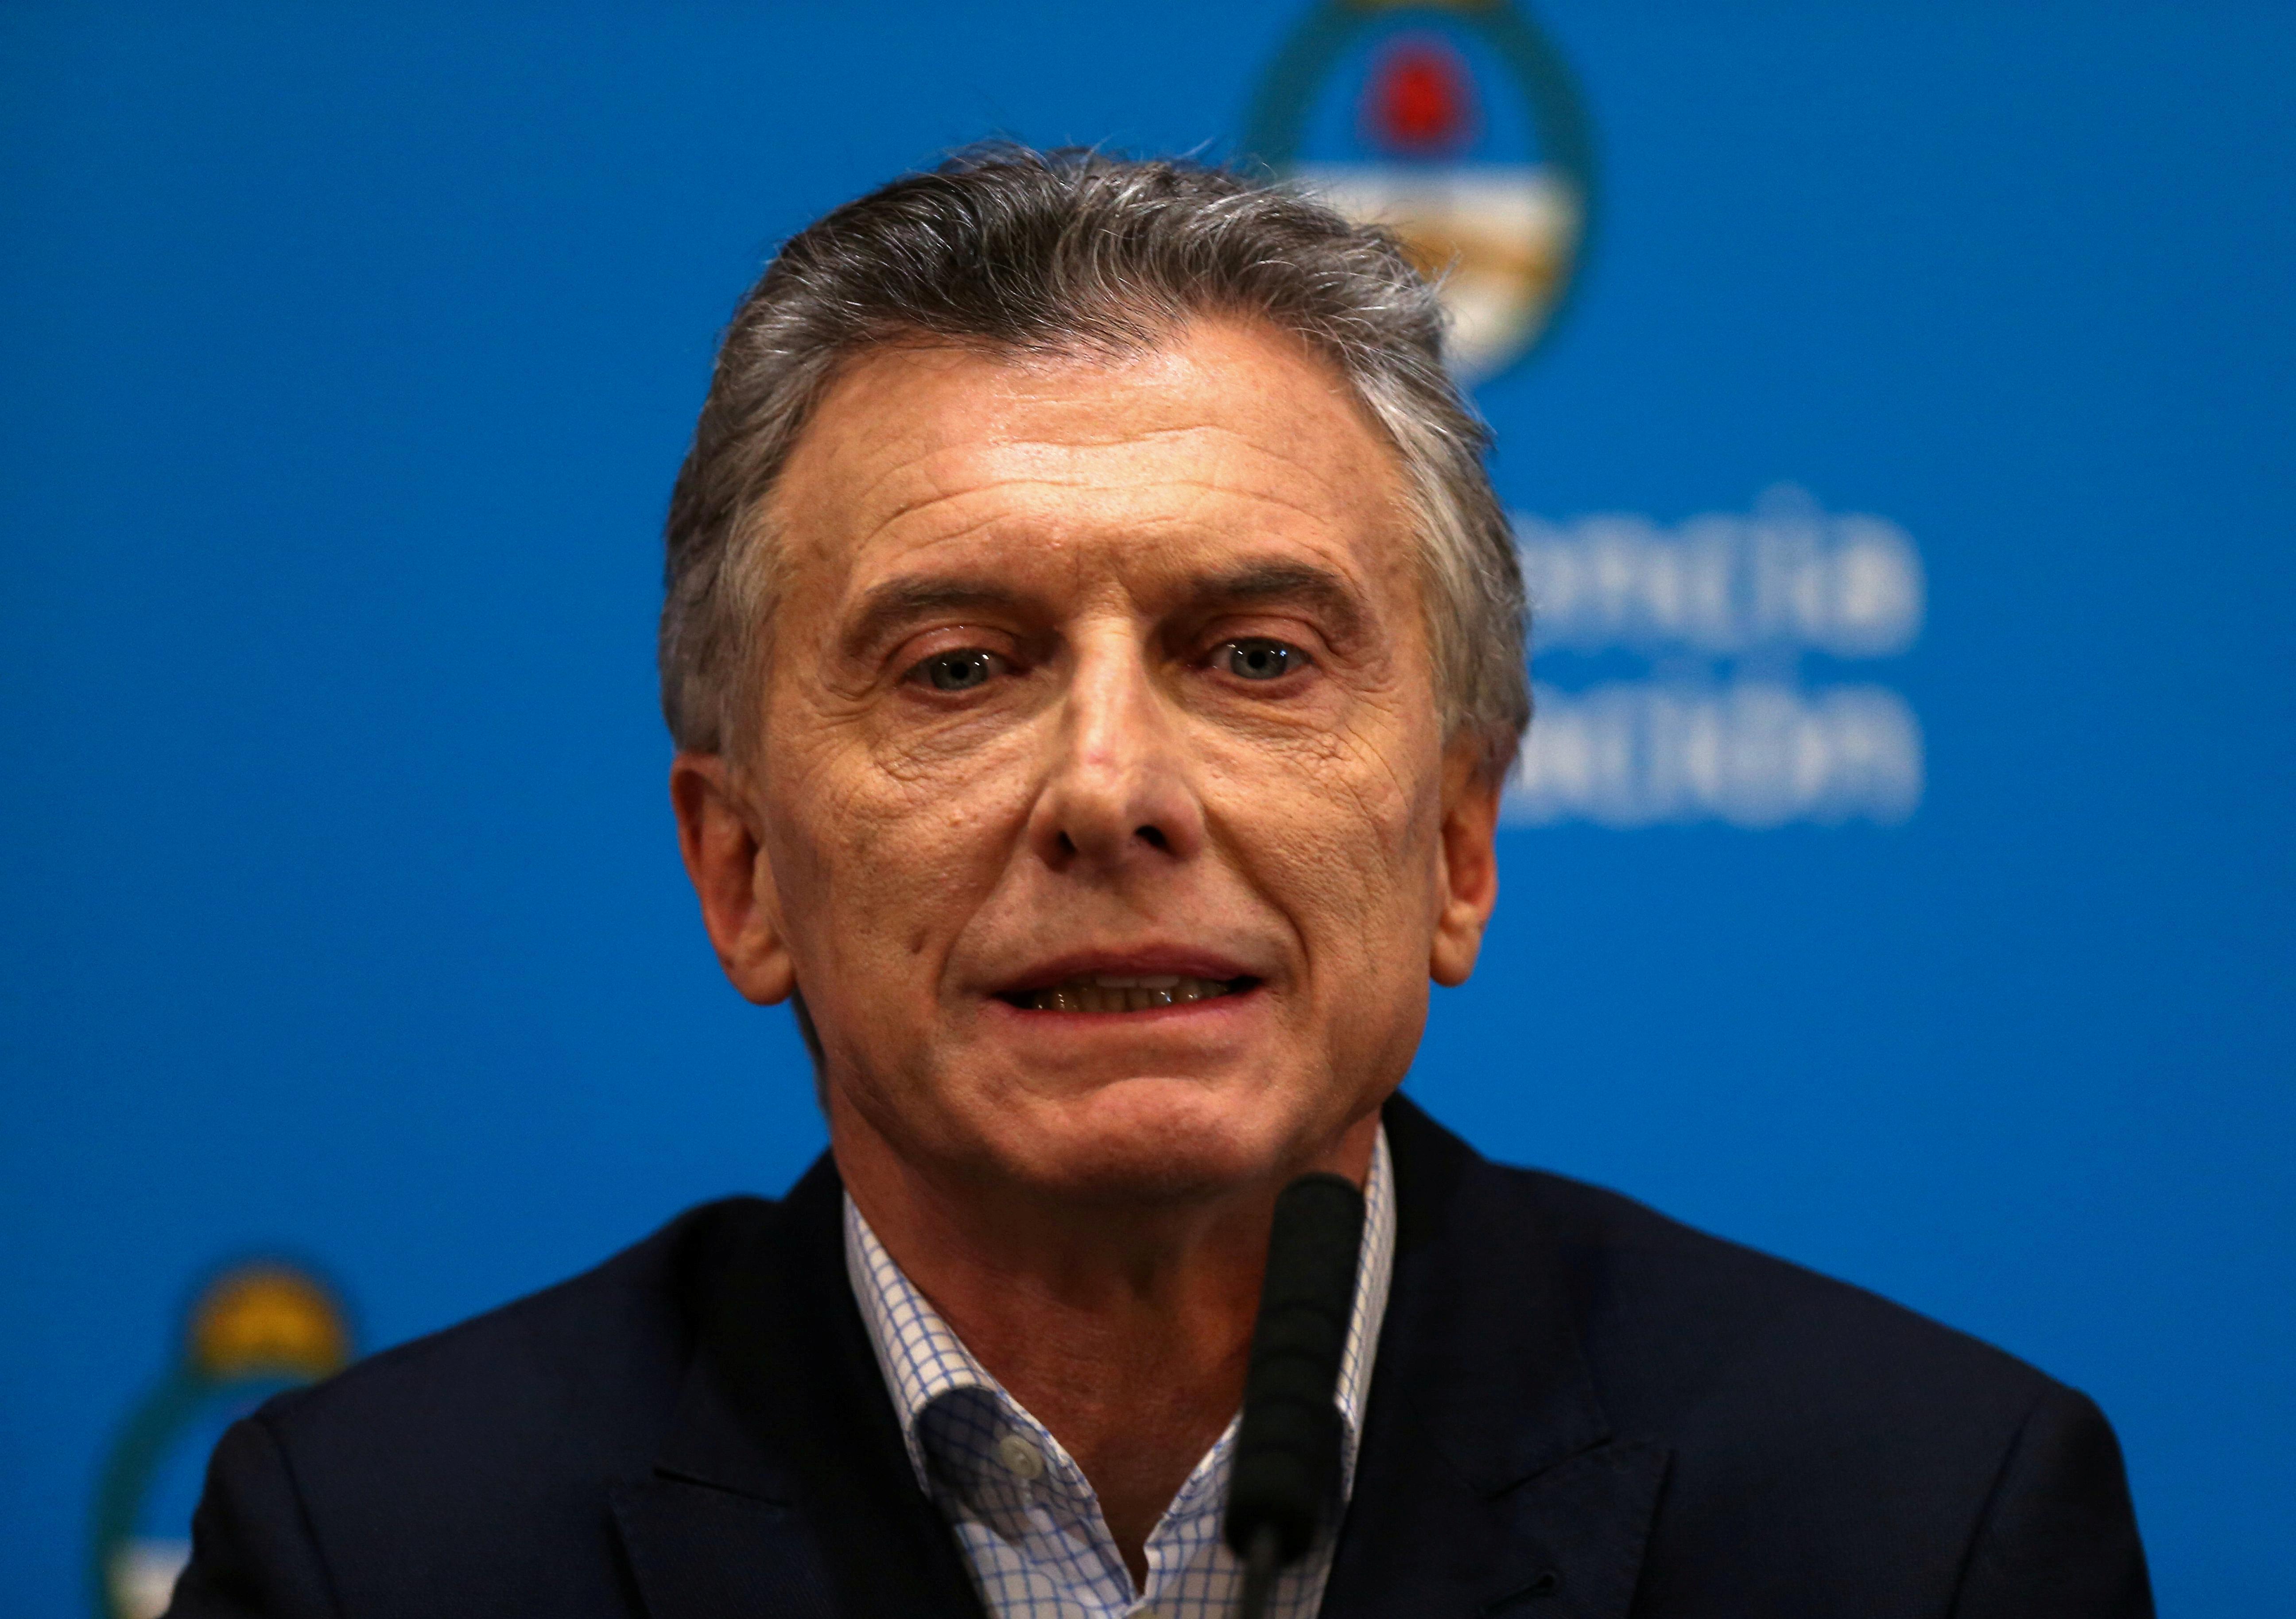 Argentina's Macri says IMF team coming next week